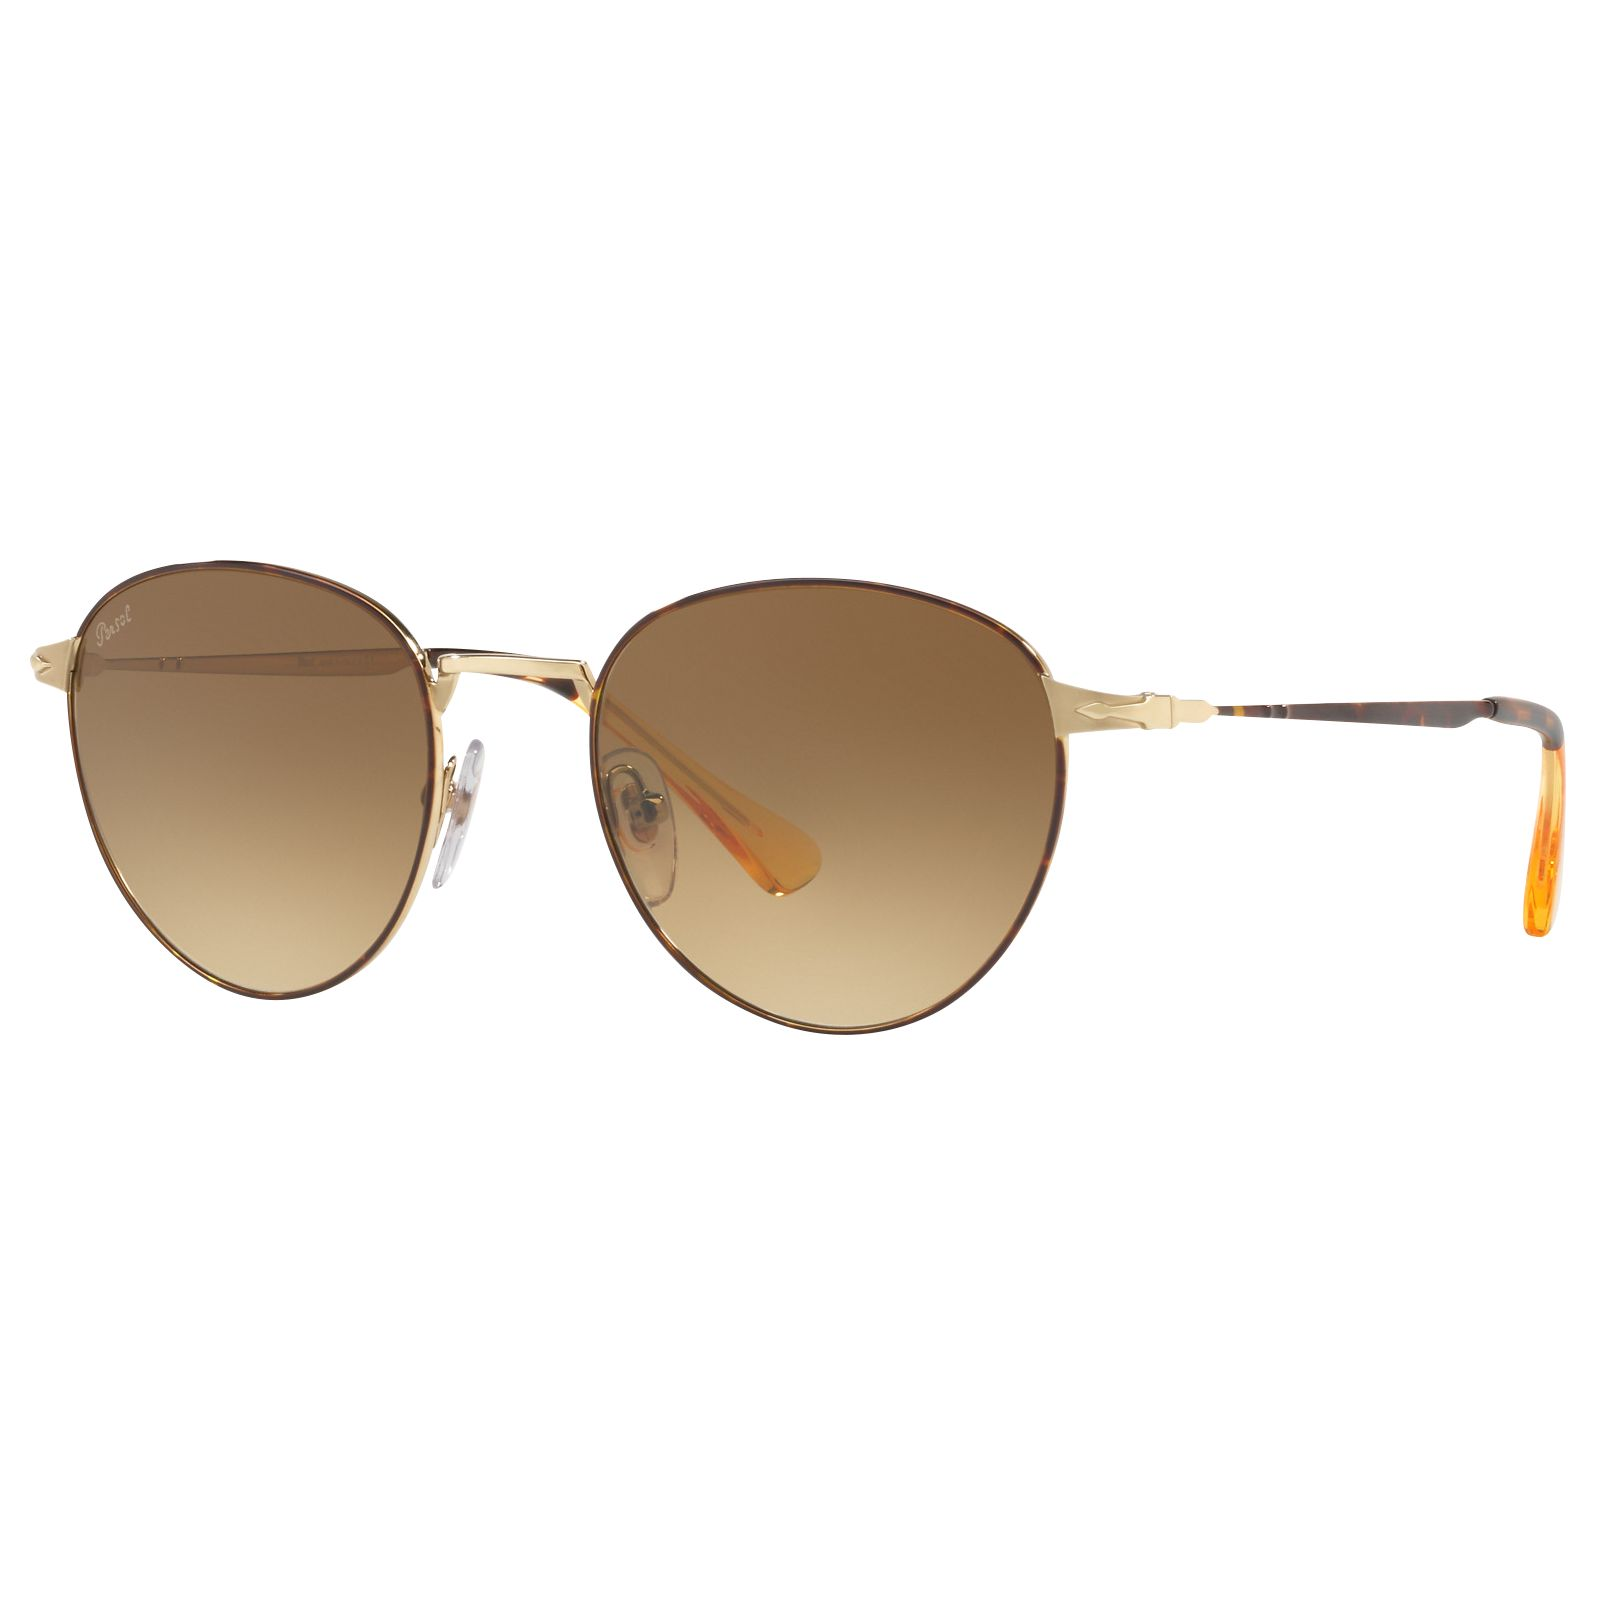 Persol Persol PO2445S Oval Sunglasses, Tortoise/Brown Gradient